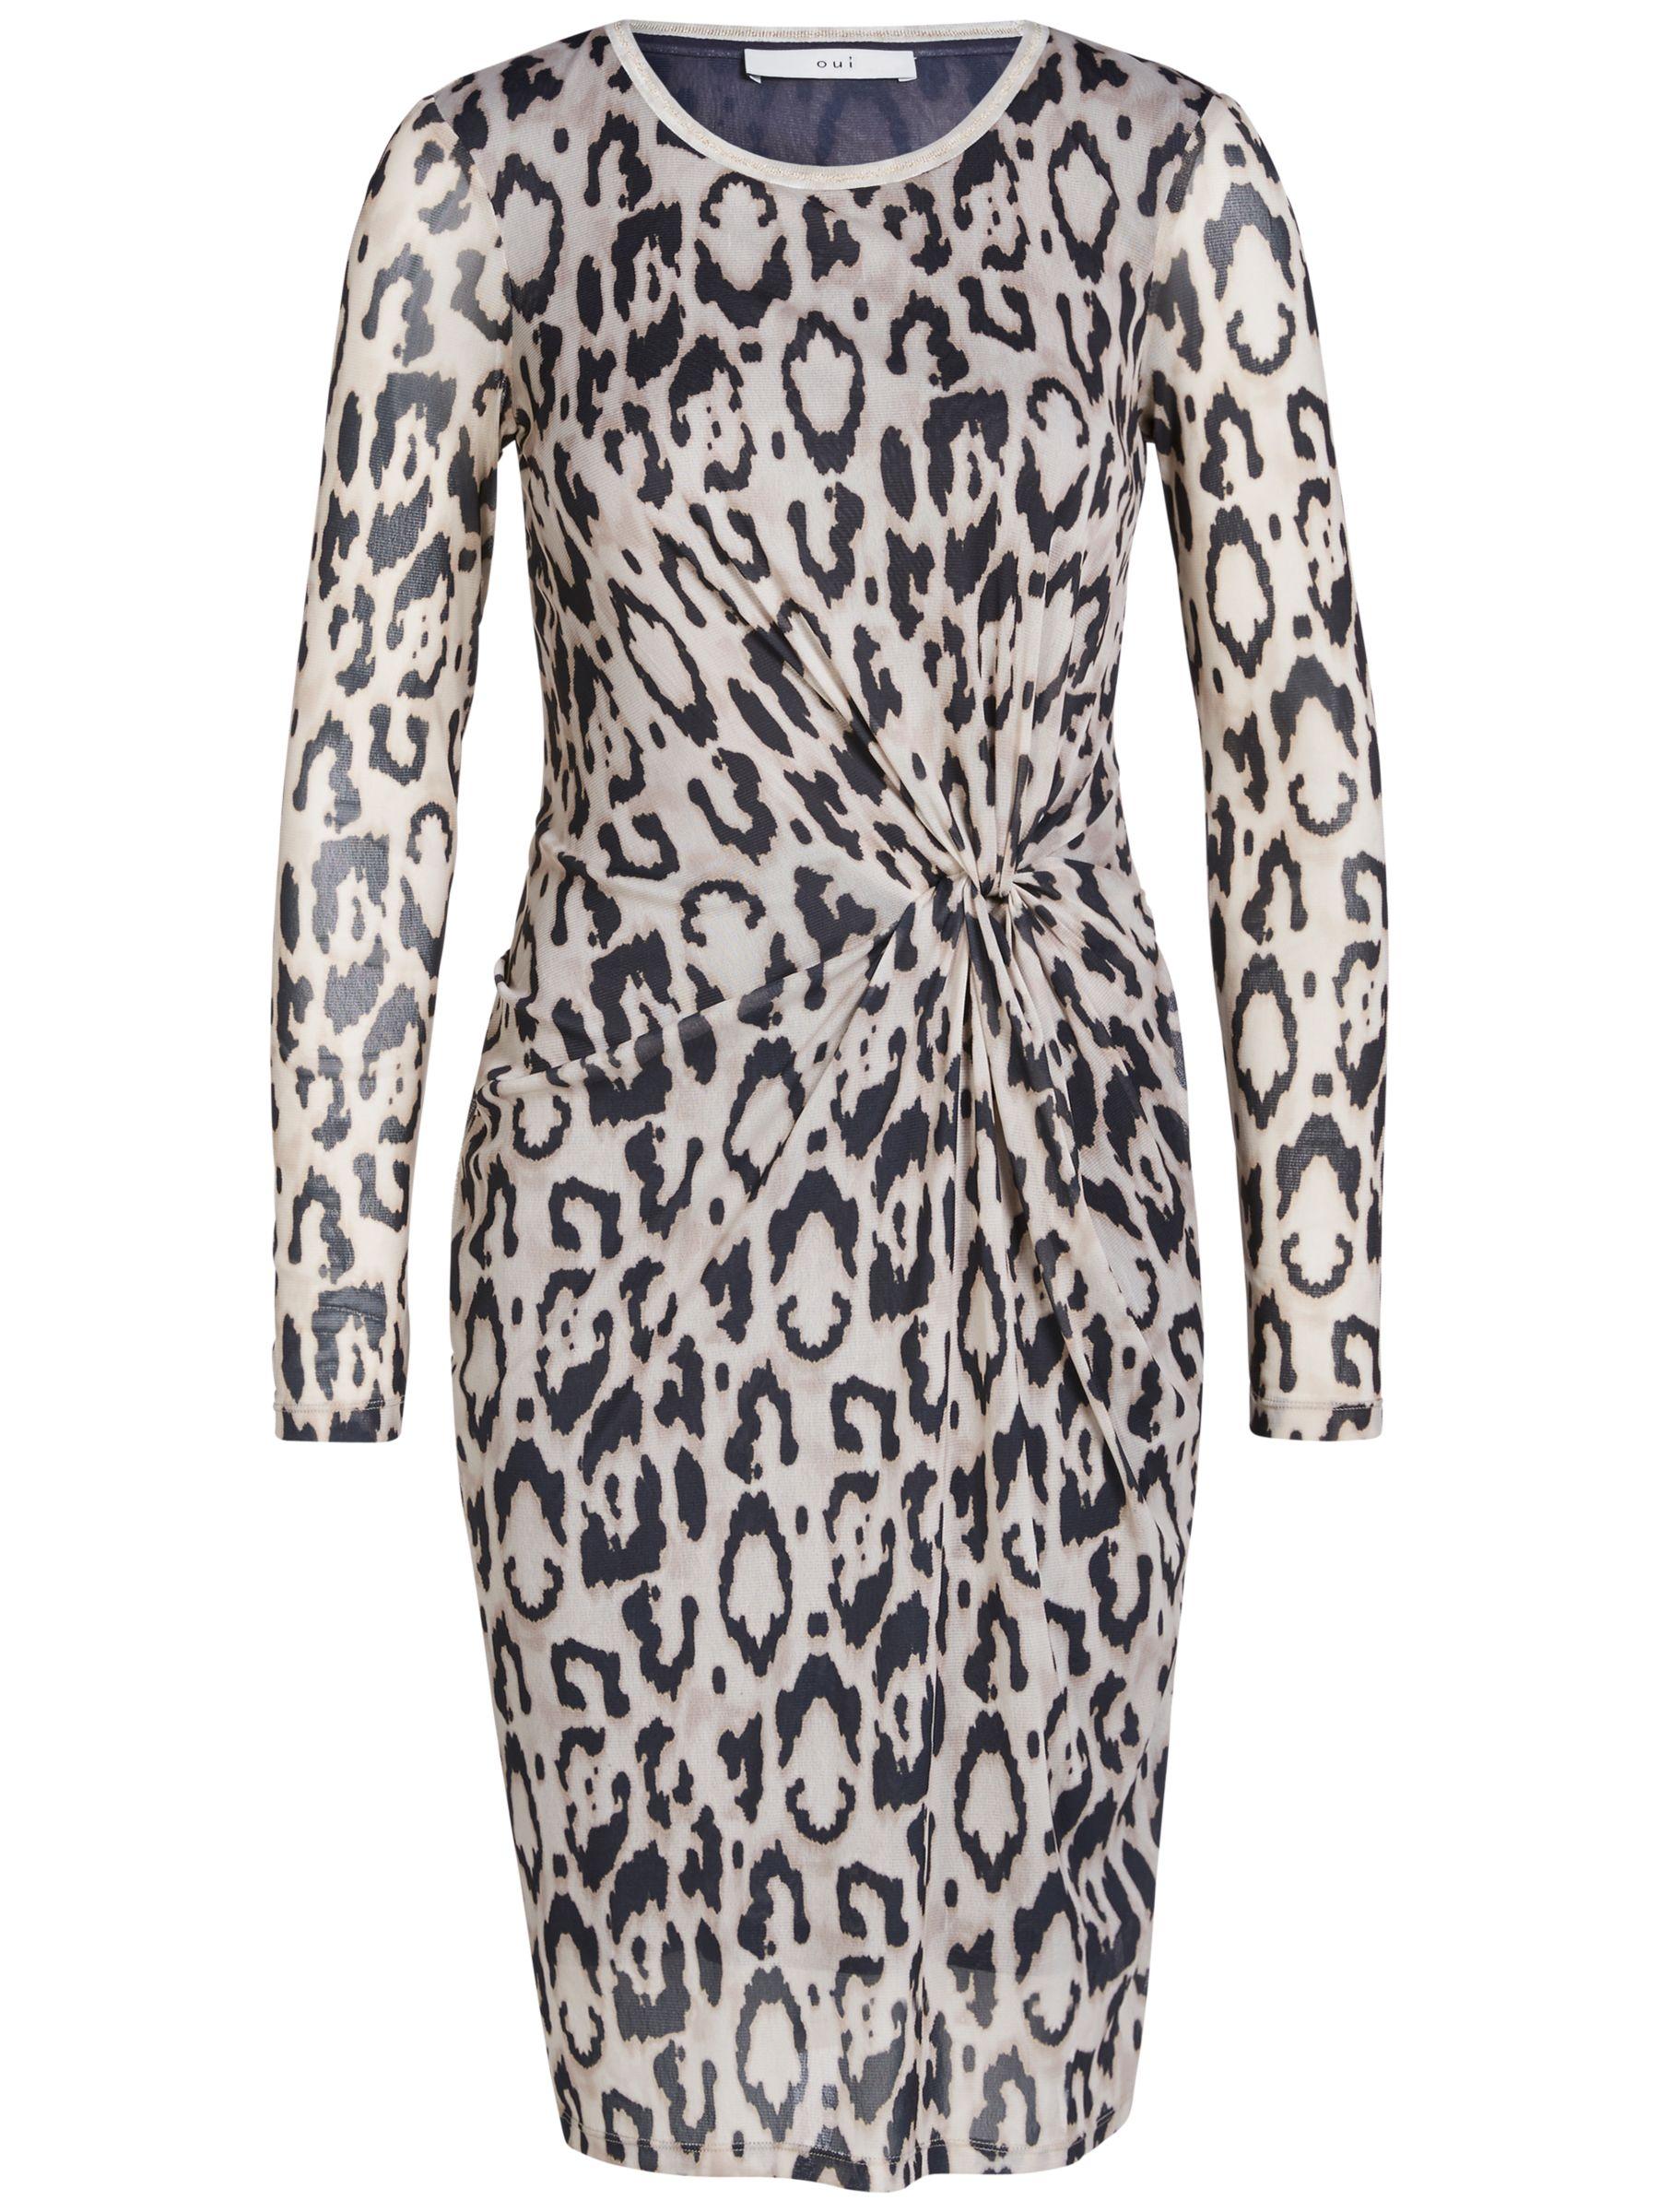 Oui Oui Animal Print Dress, Camel/Grey